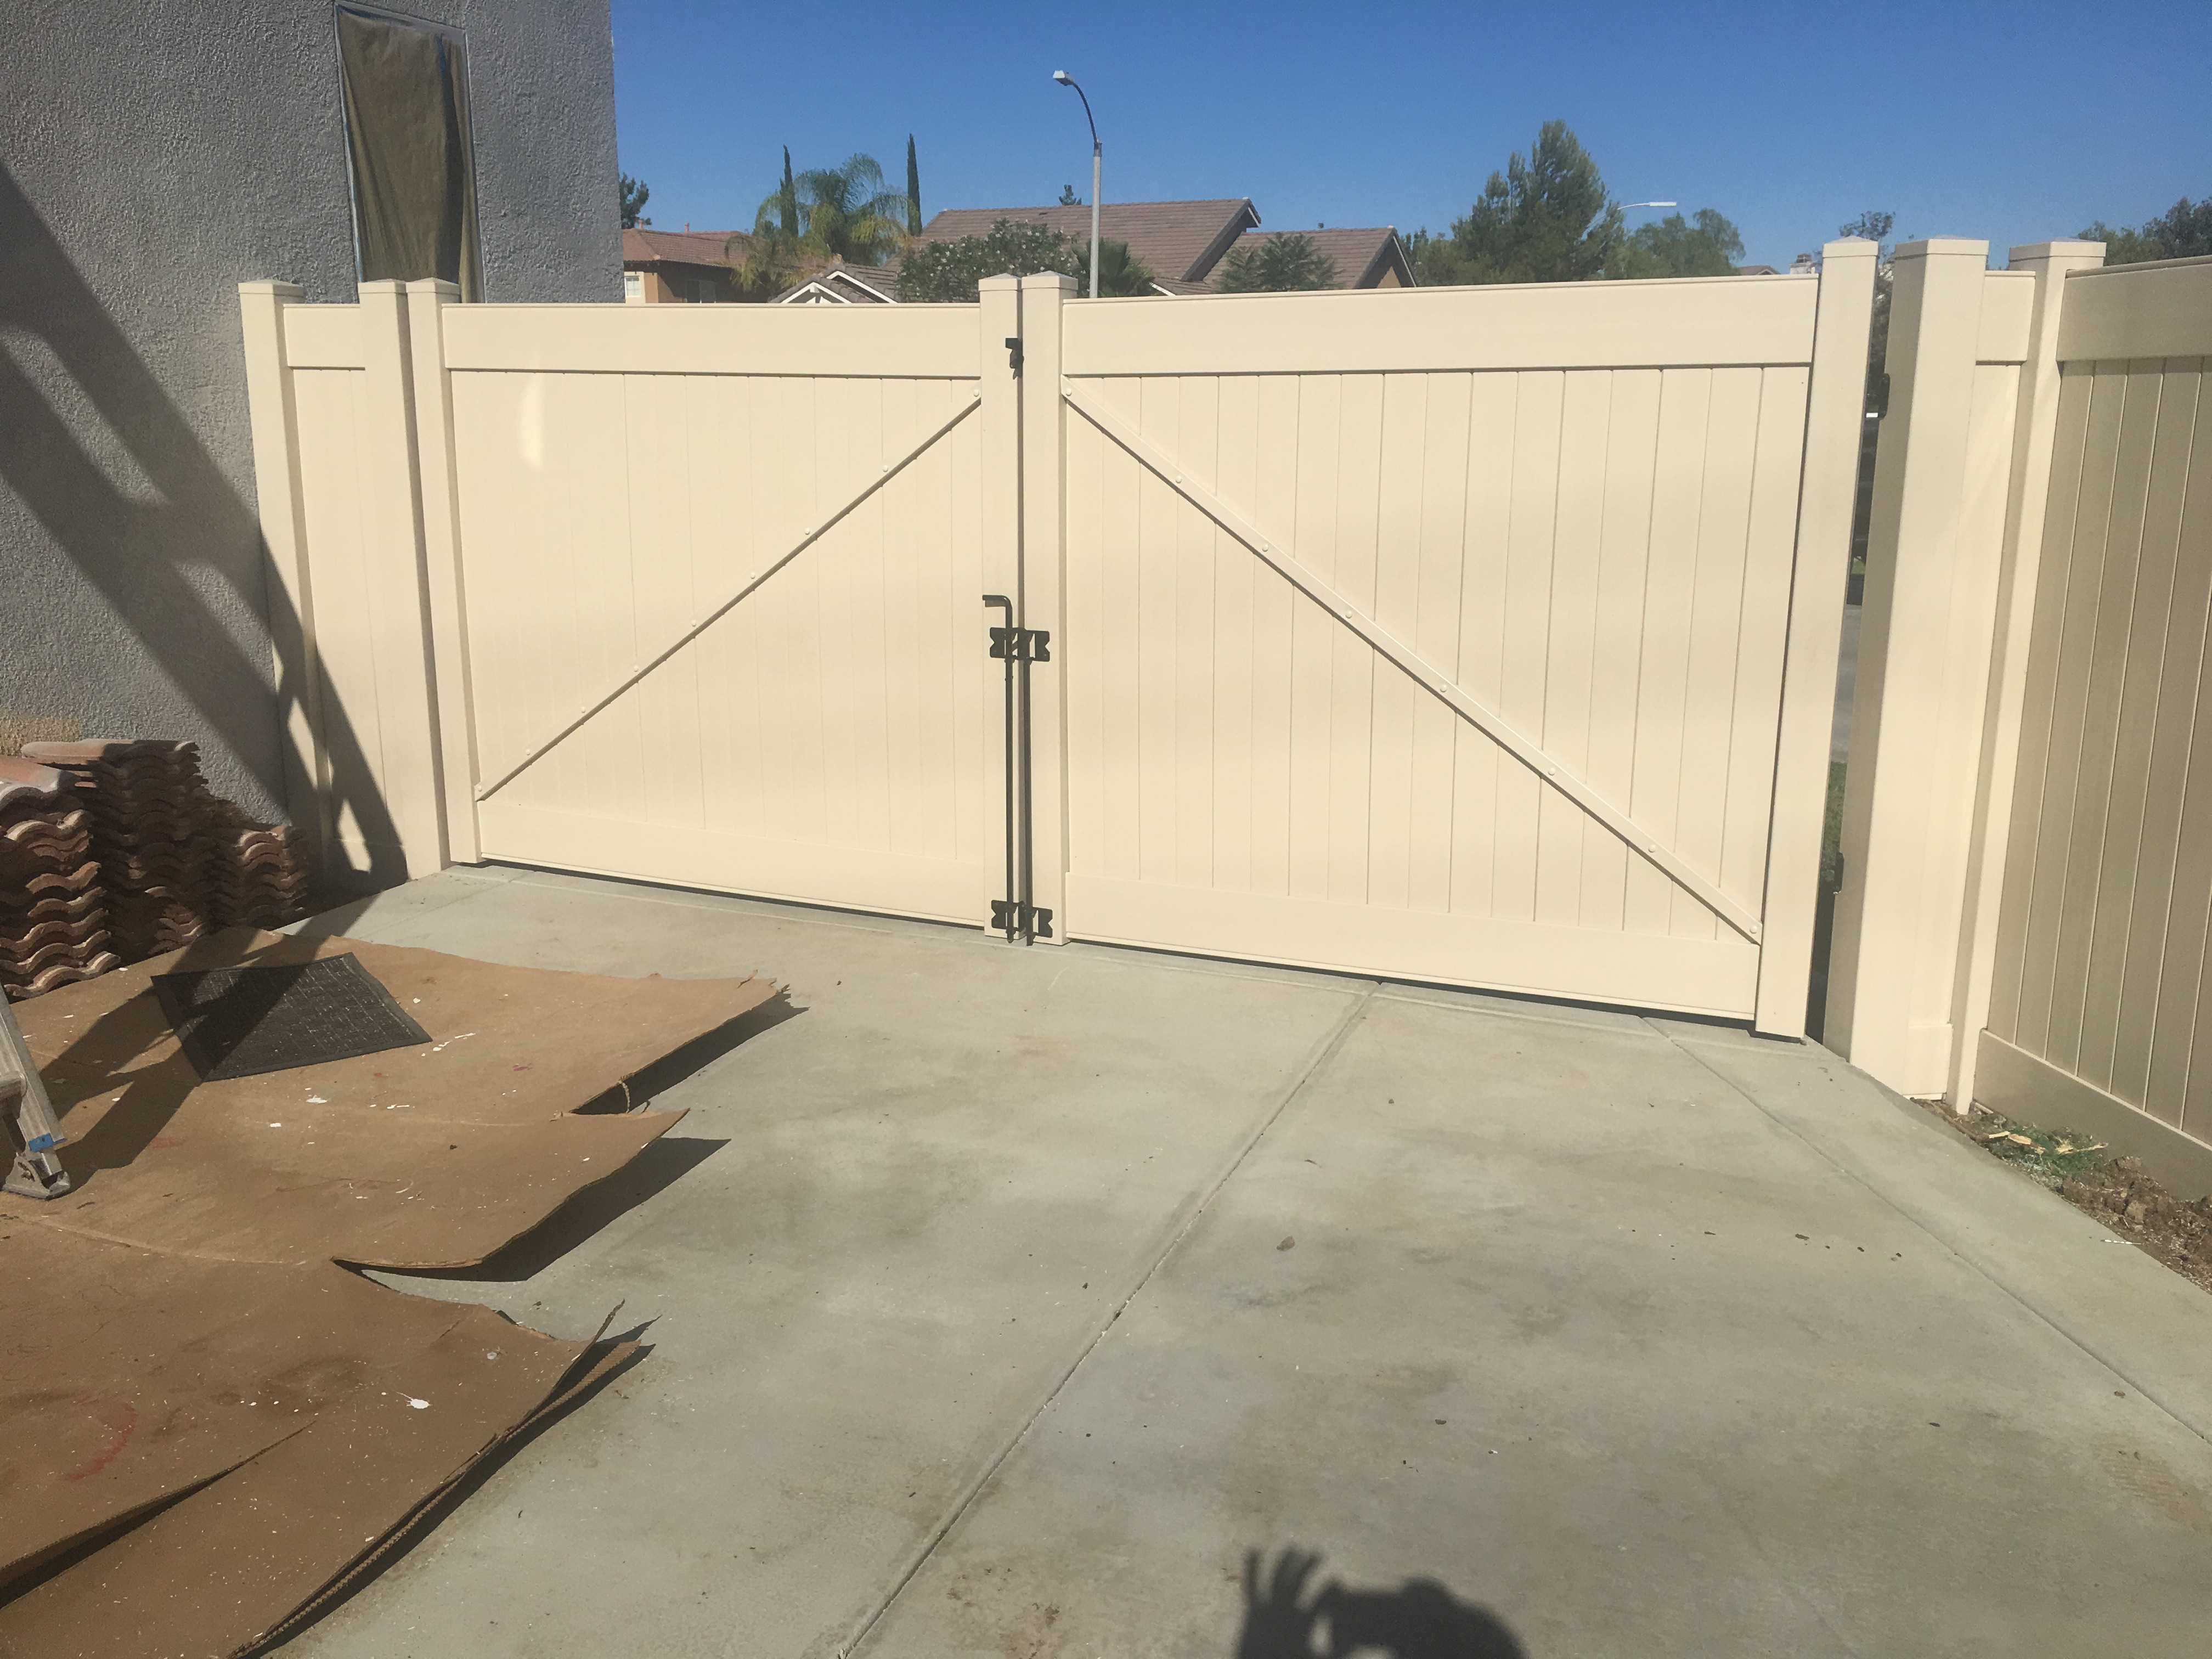 3T Fence image 24